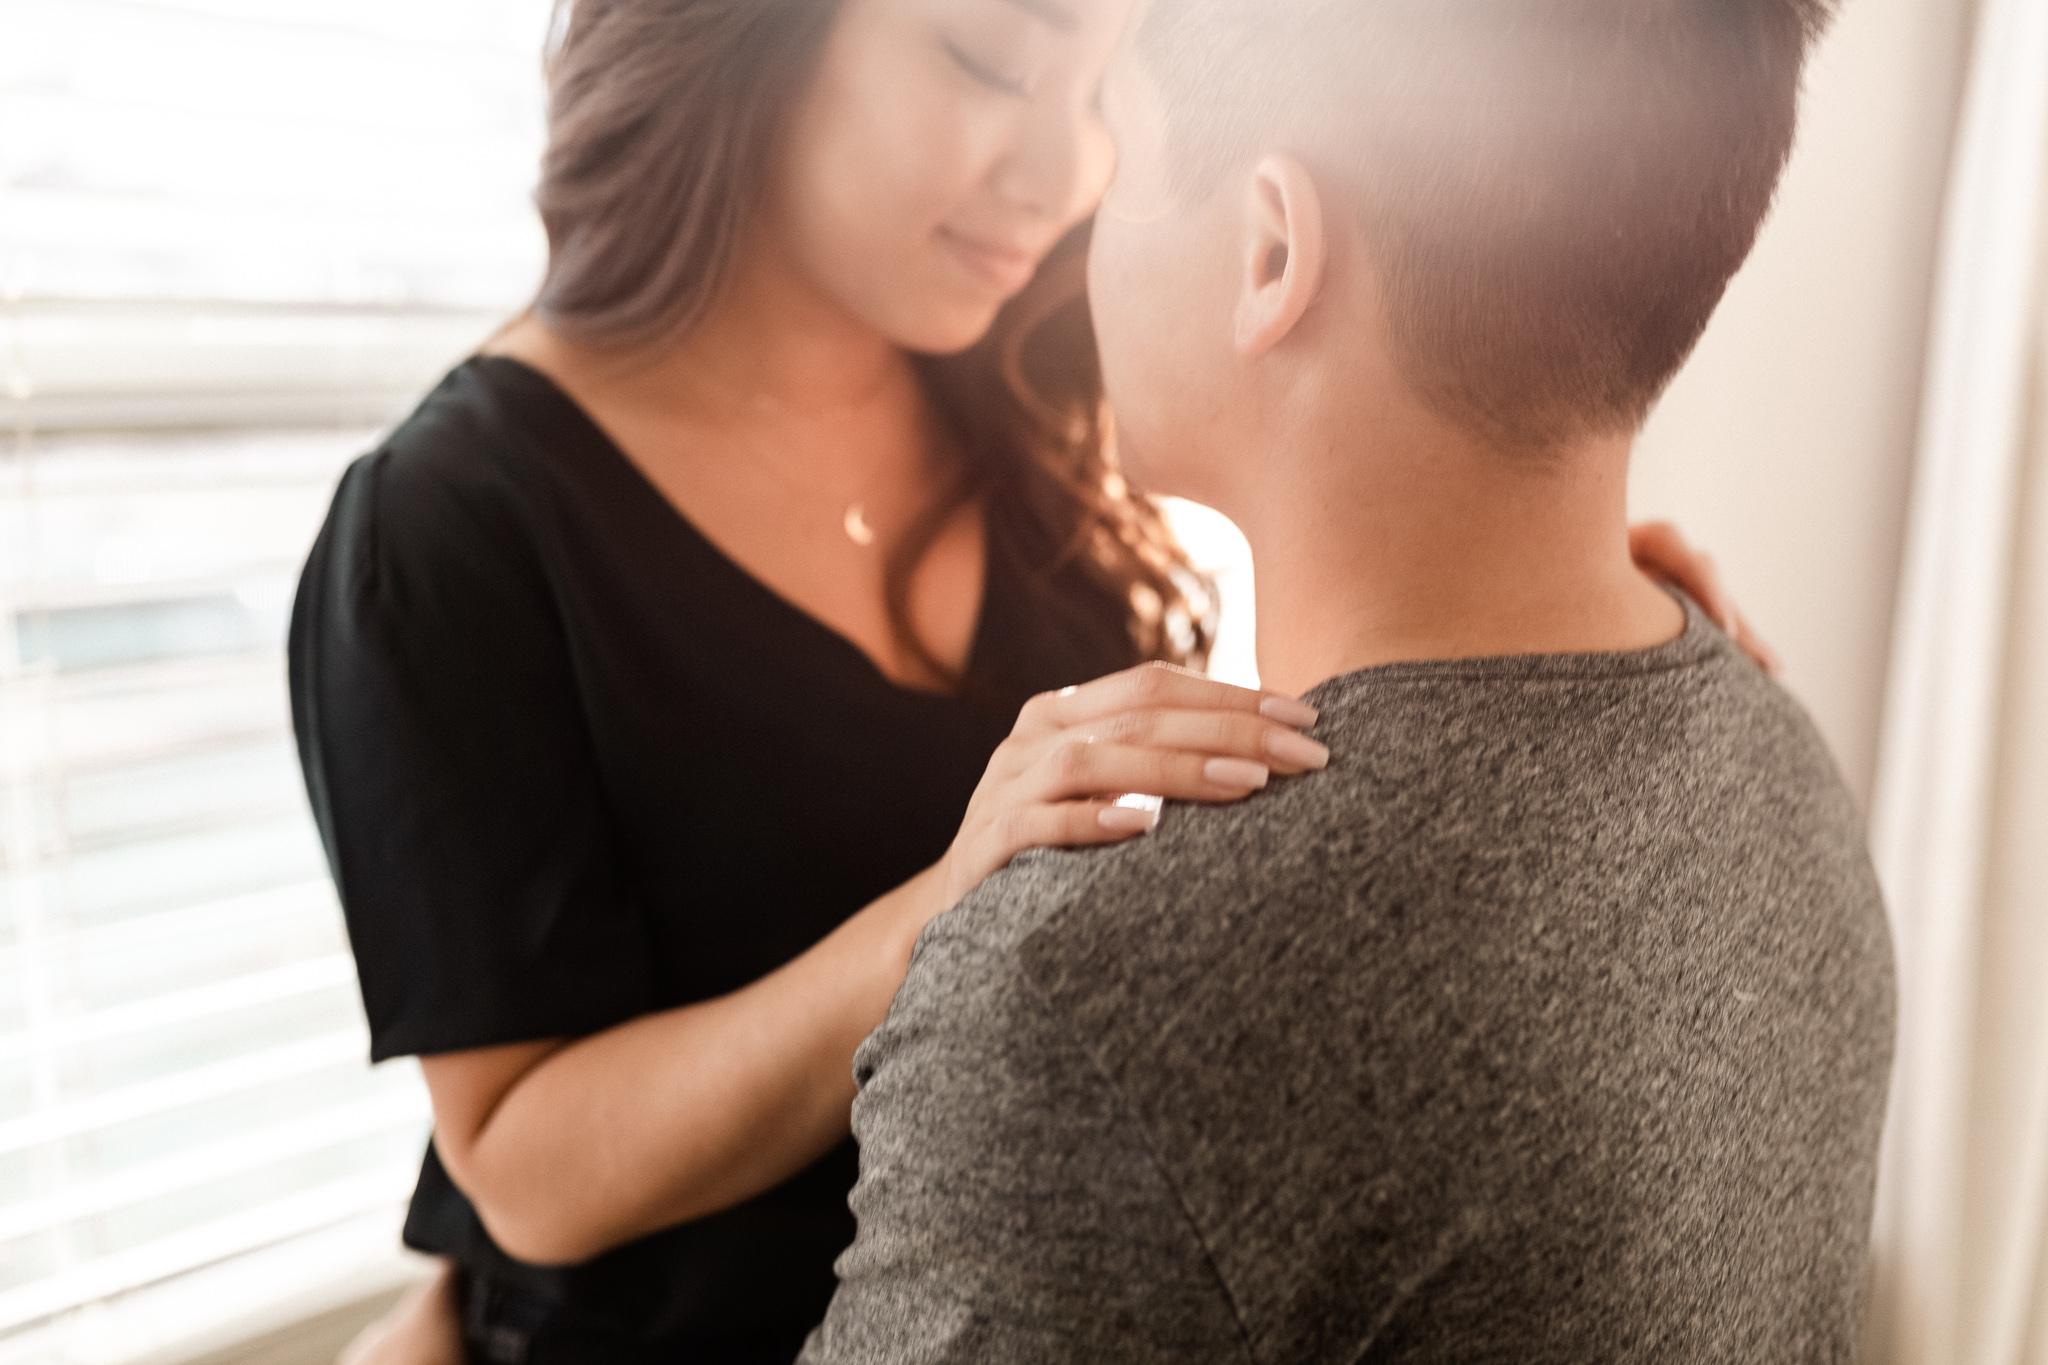 Hieu + Teresa | Colorful Romantic Downtown Engagements | Oklahoma Wedding Photographer-33.jpg